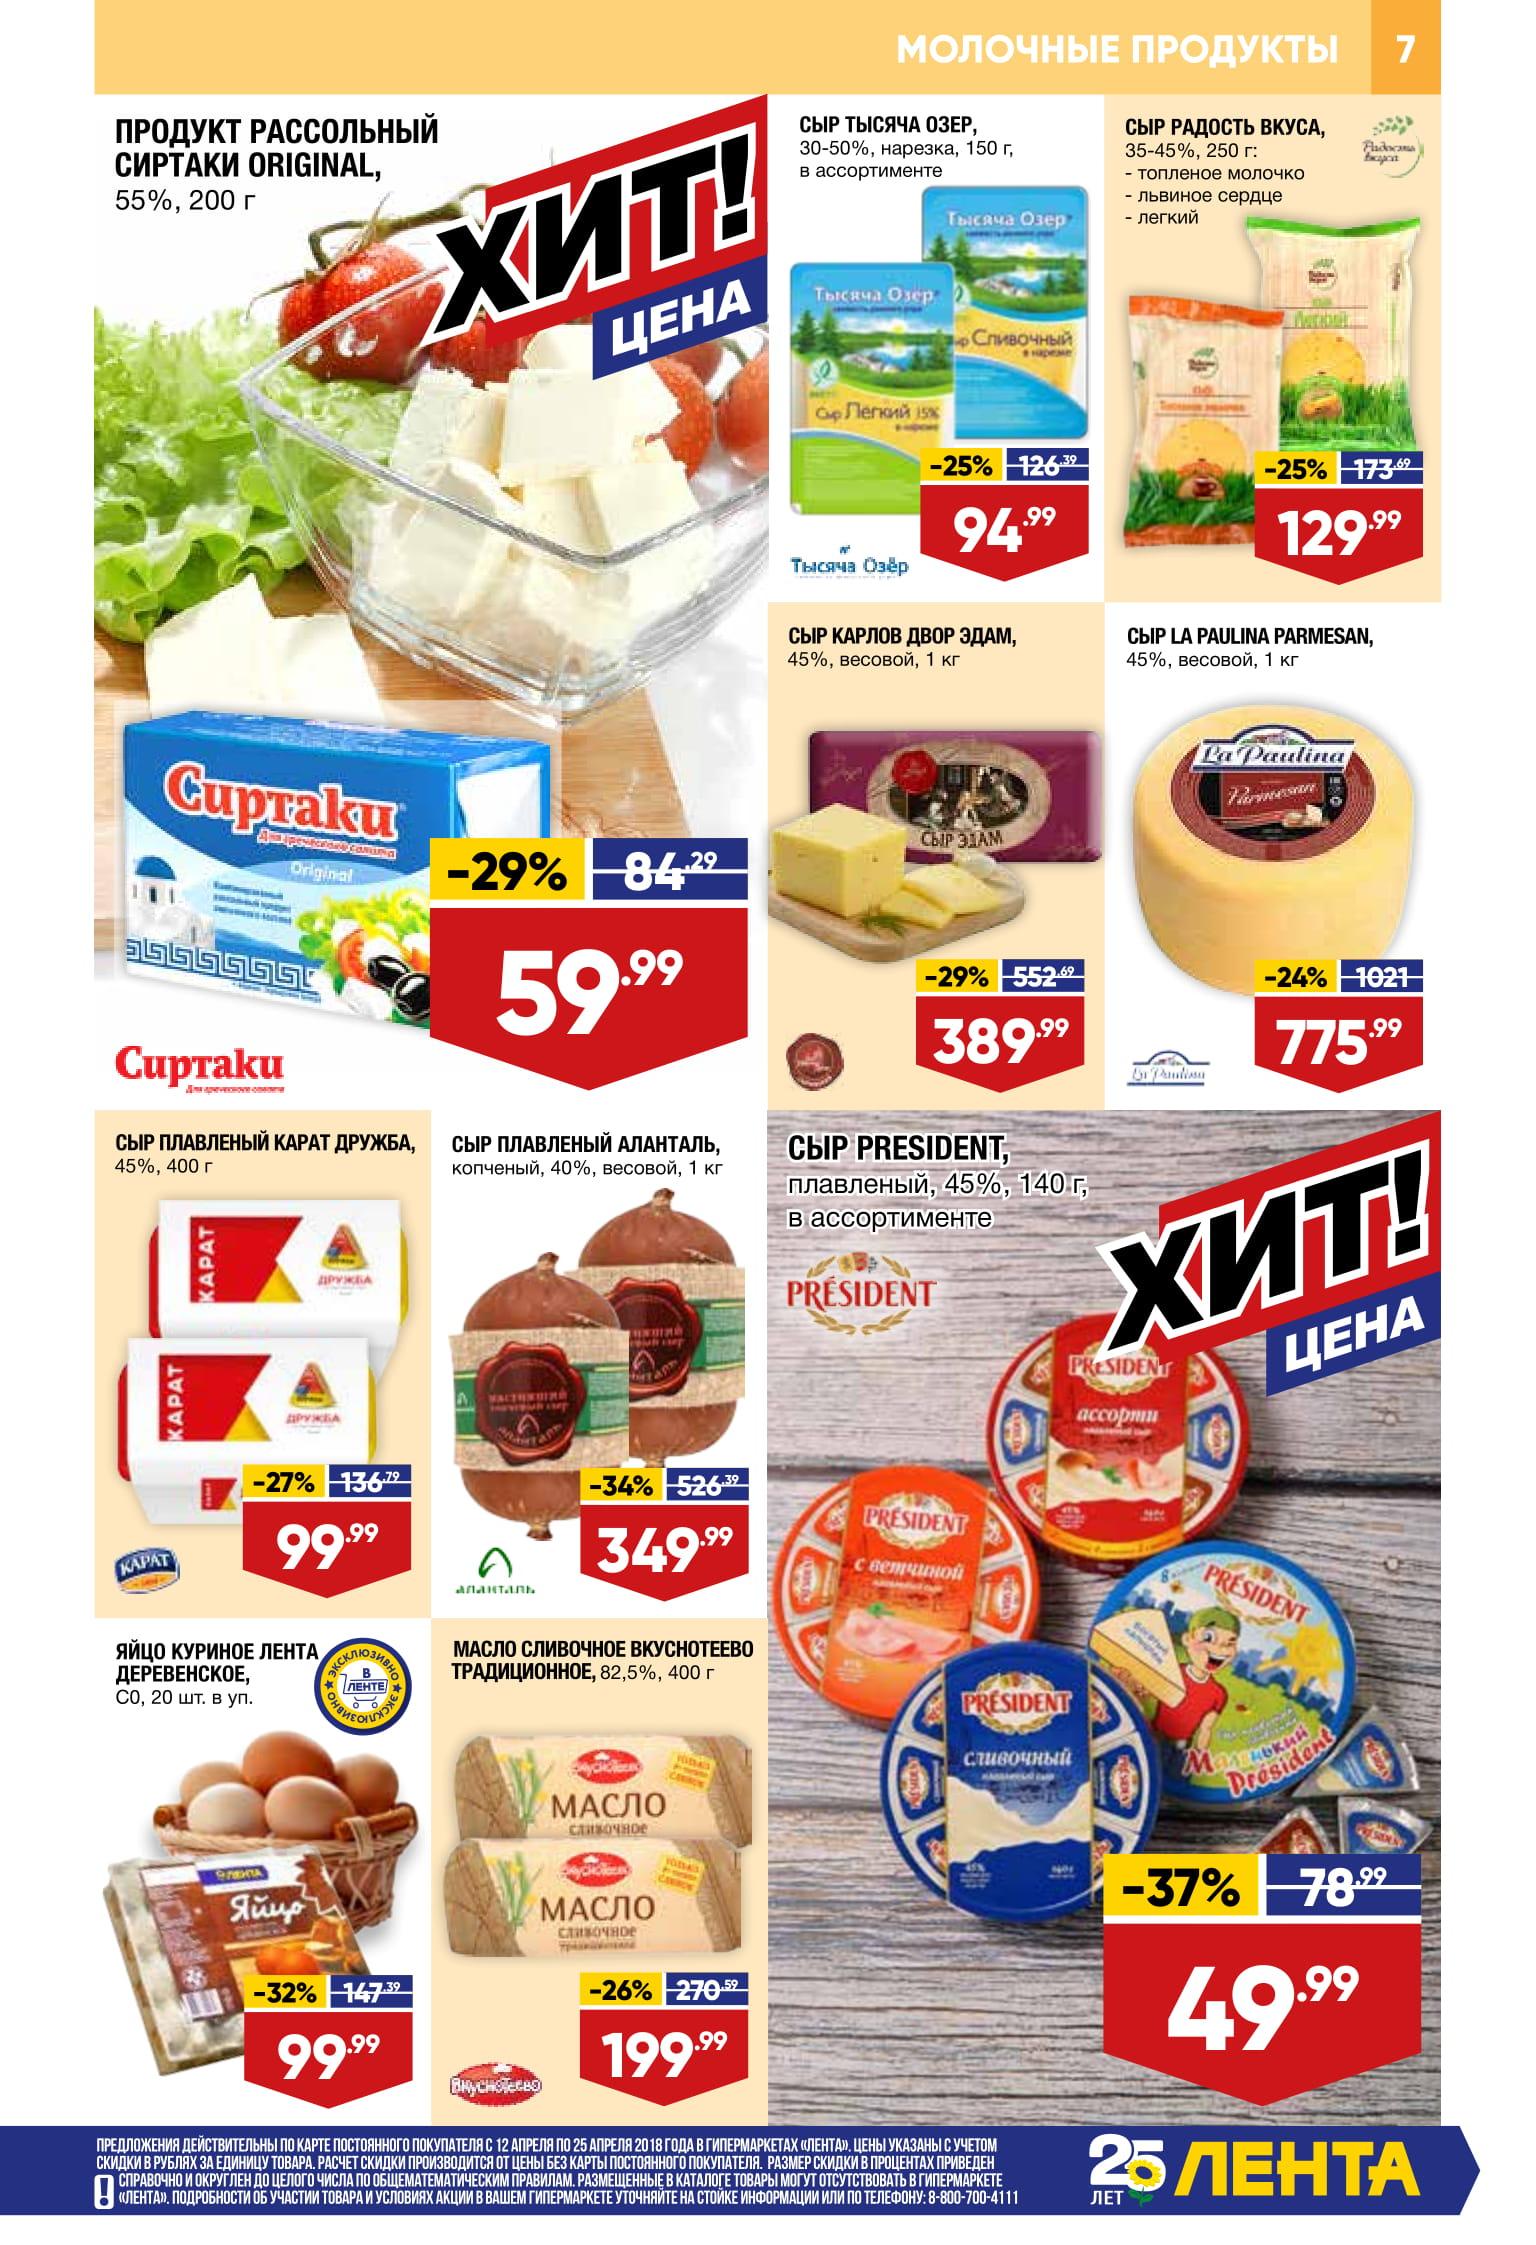 Акции в Ленте с 12 апреля 2018. Каталог товаров.